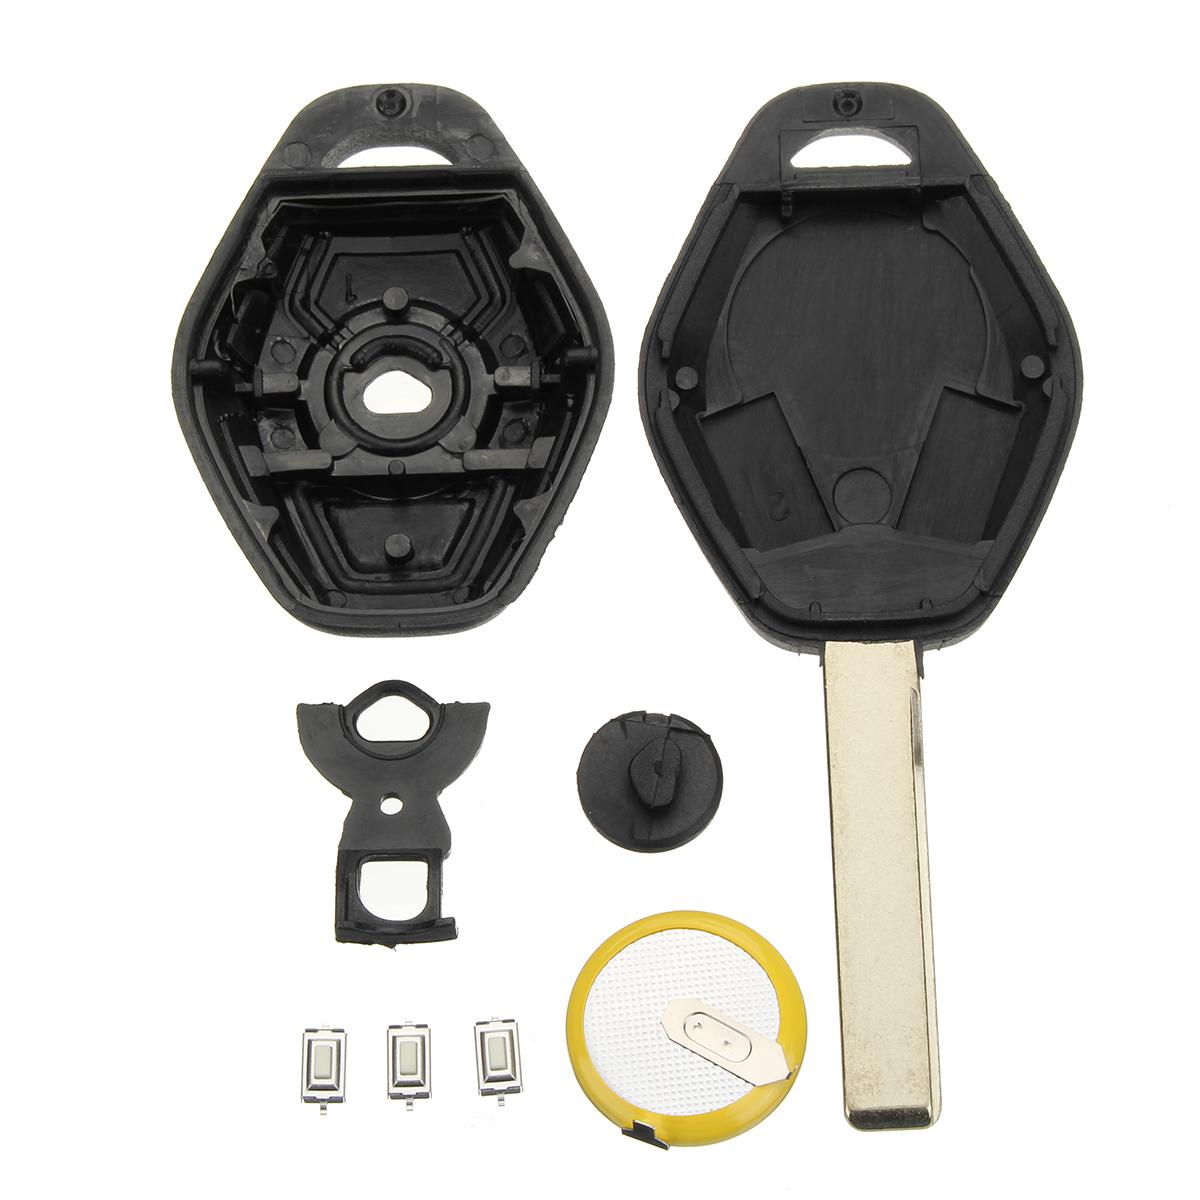 3 Buttons Diamond Remote Key Case Full Repair Kit For BMW E46 3 5 7 Z3